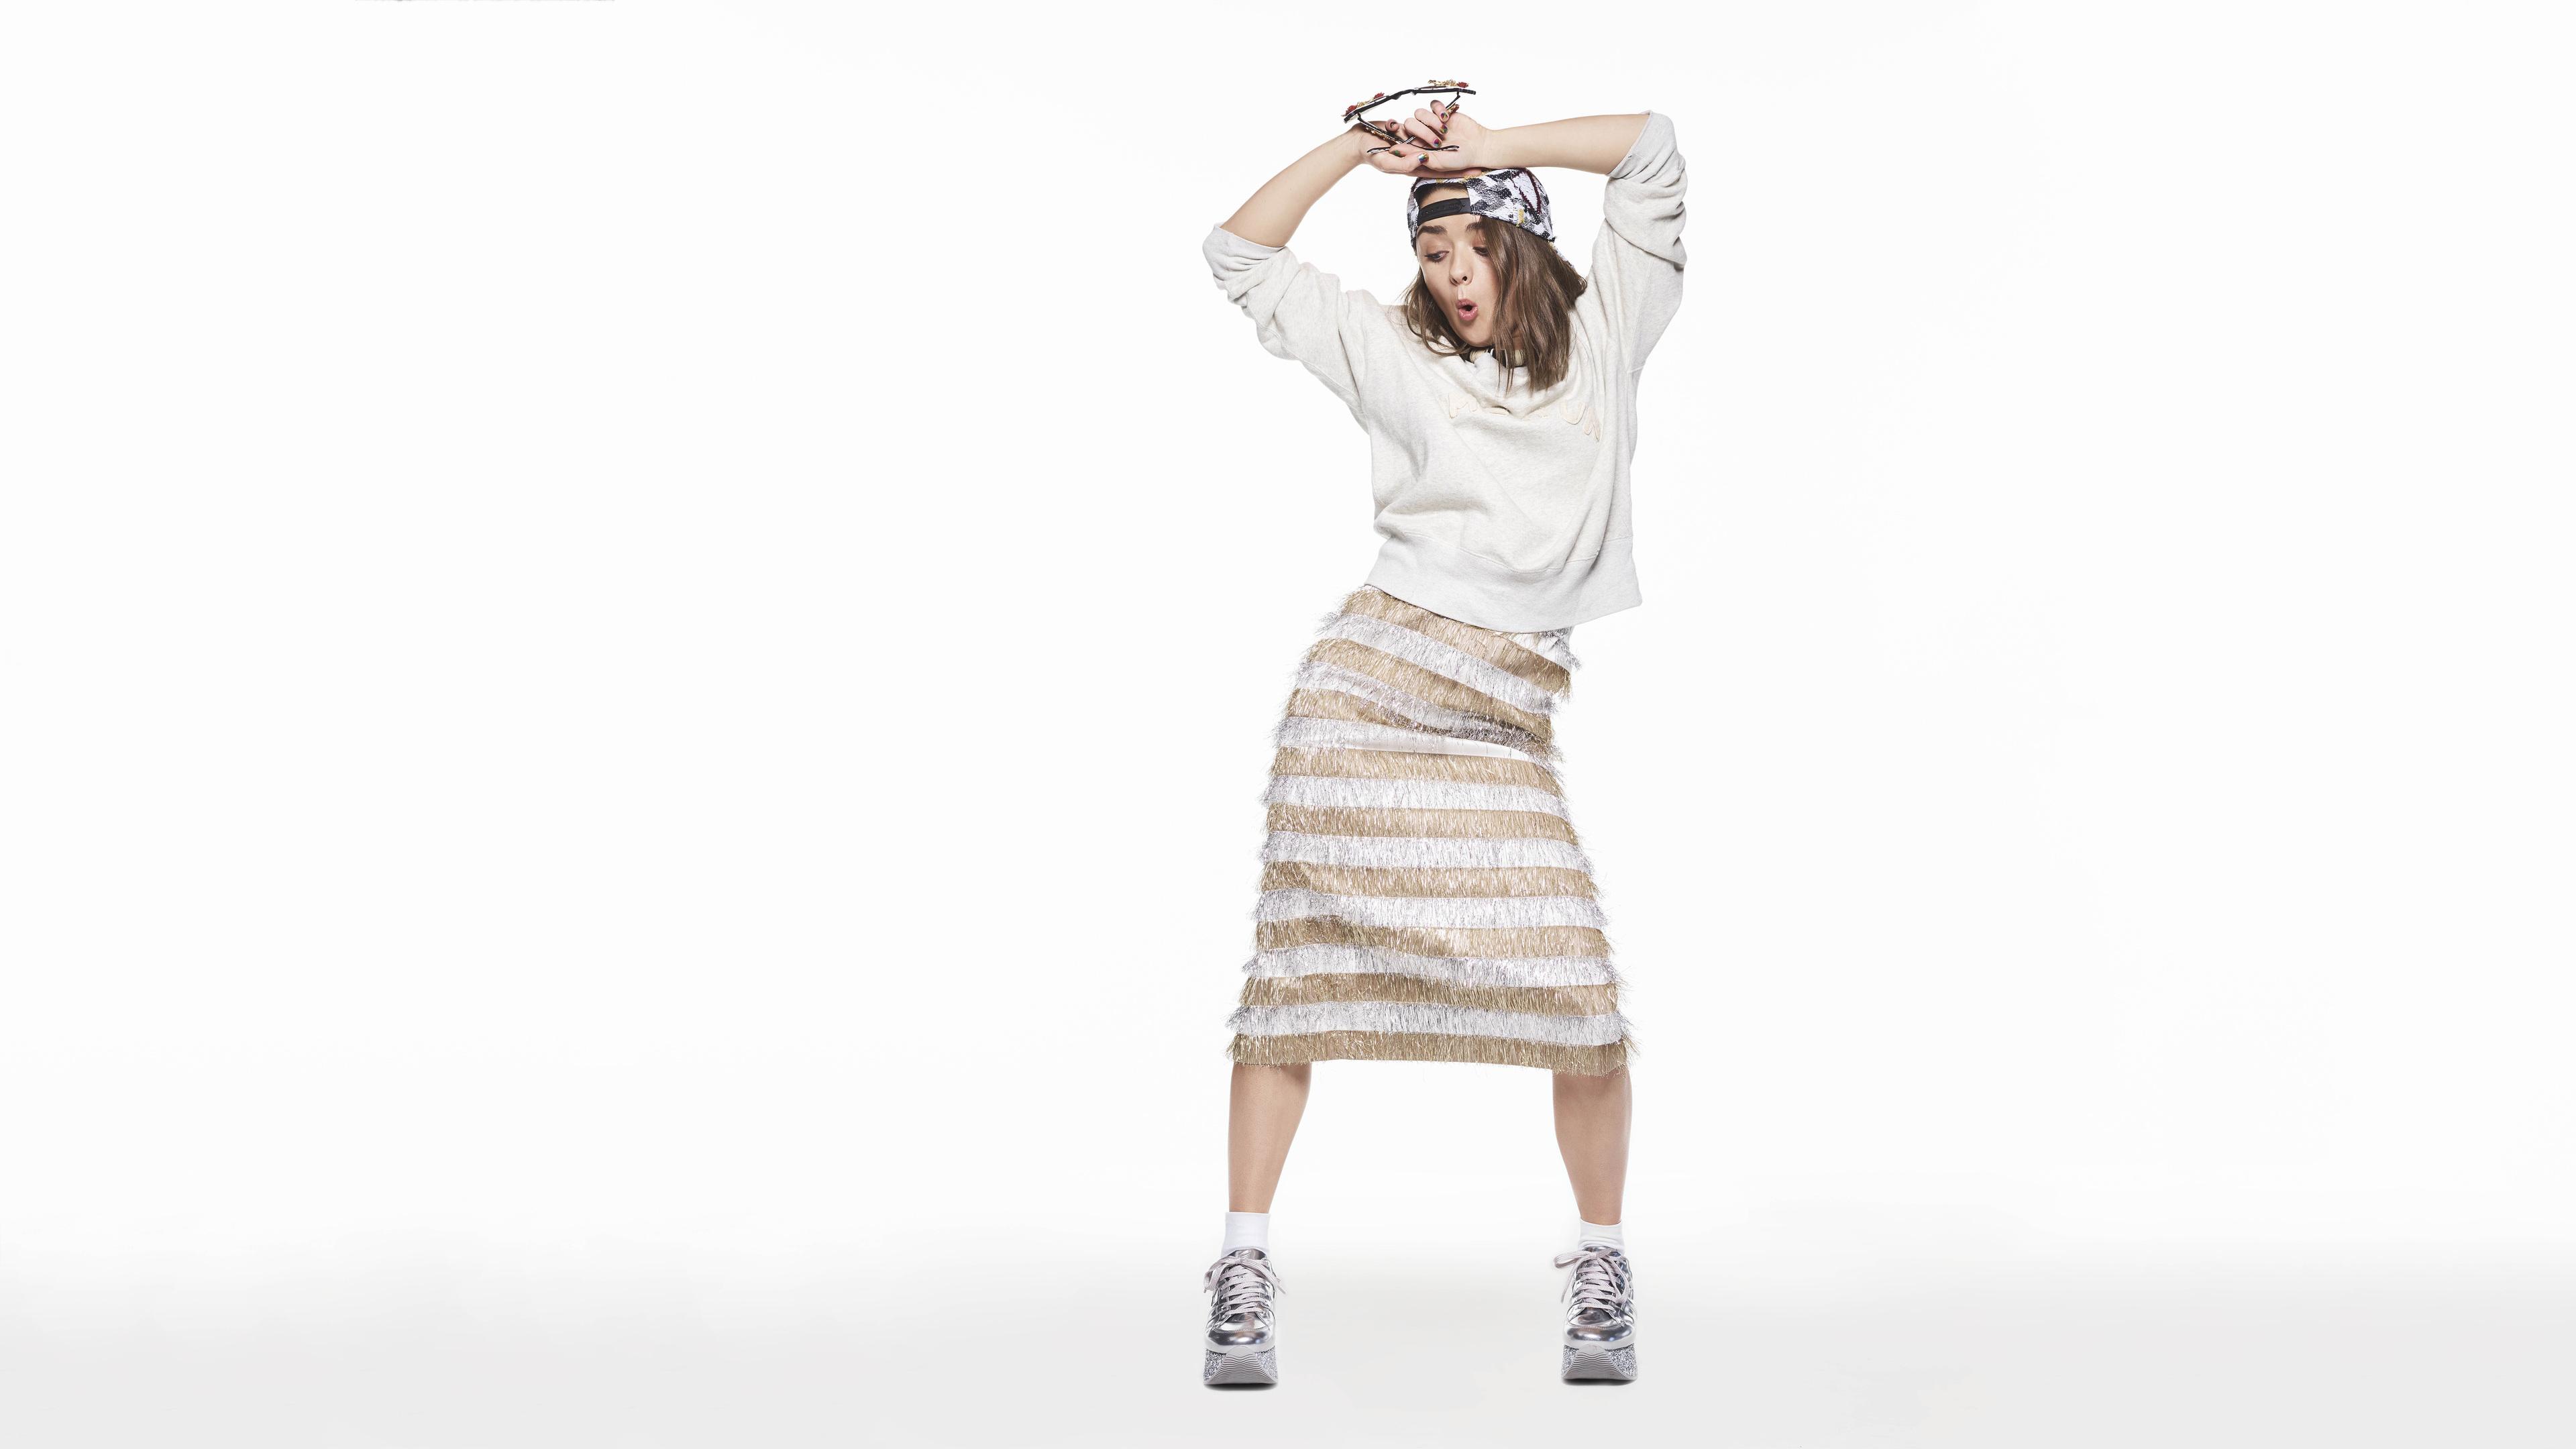 maisie williams 8k 1536861314 - Maisie Williams 8k - maisie williams wallpapers, hd-wallpapers, girls wallpapers, celebrities wallpapers, 8k wallpapers, 5k wallpapers, 4k-wallpapers